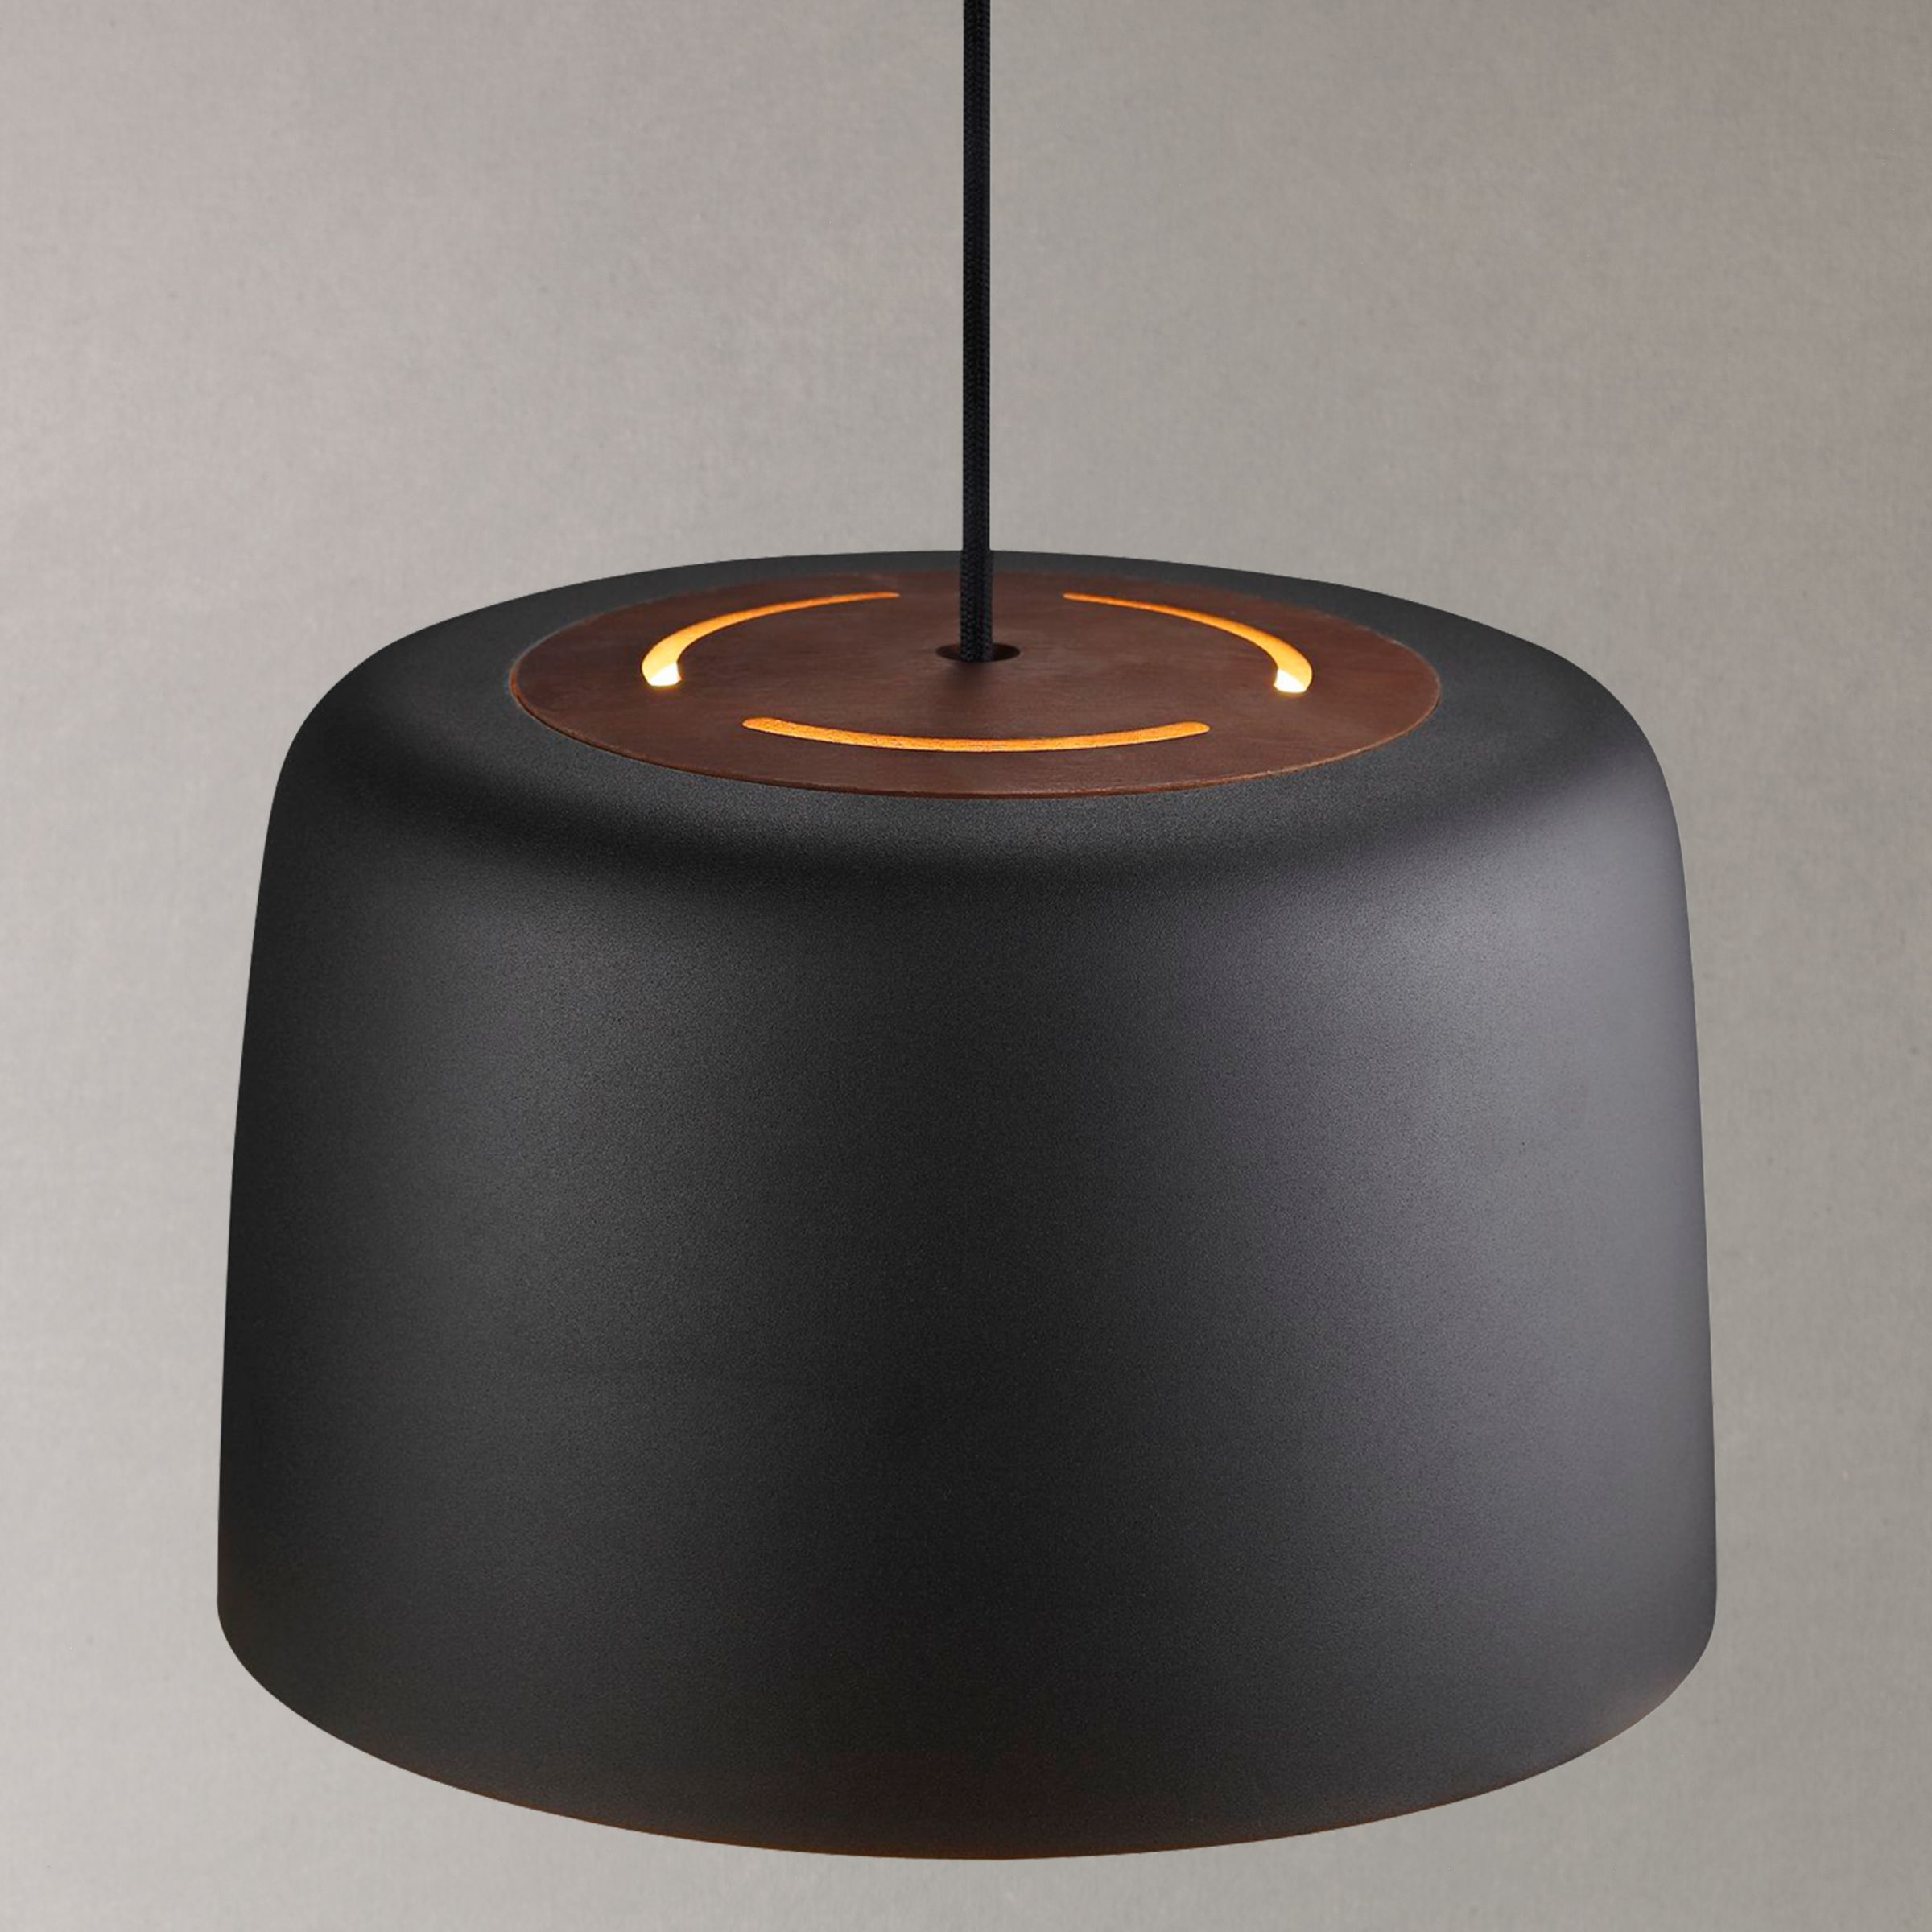 Nordlux Nordlux Vision Ceiling Light, Black